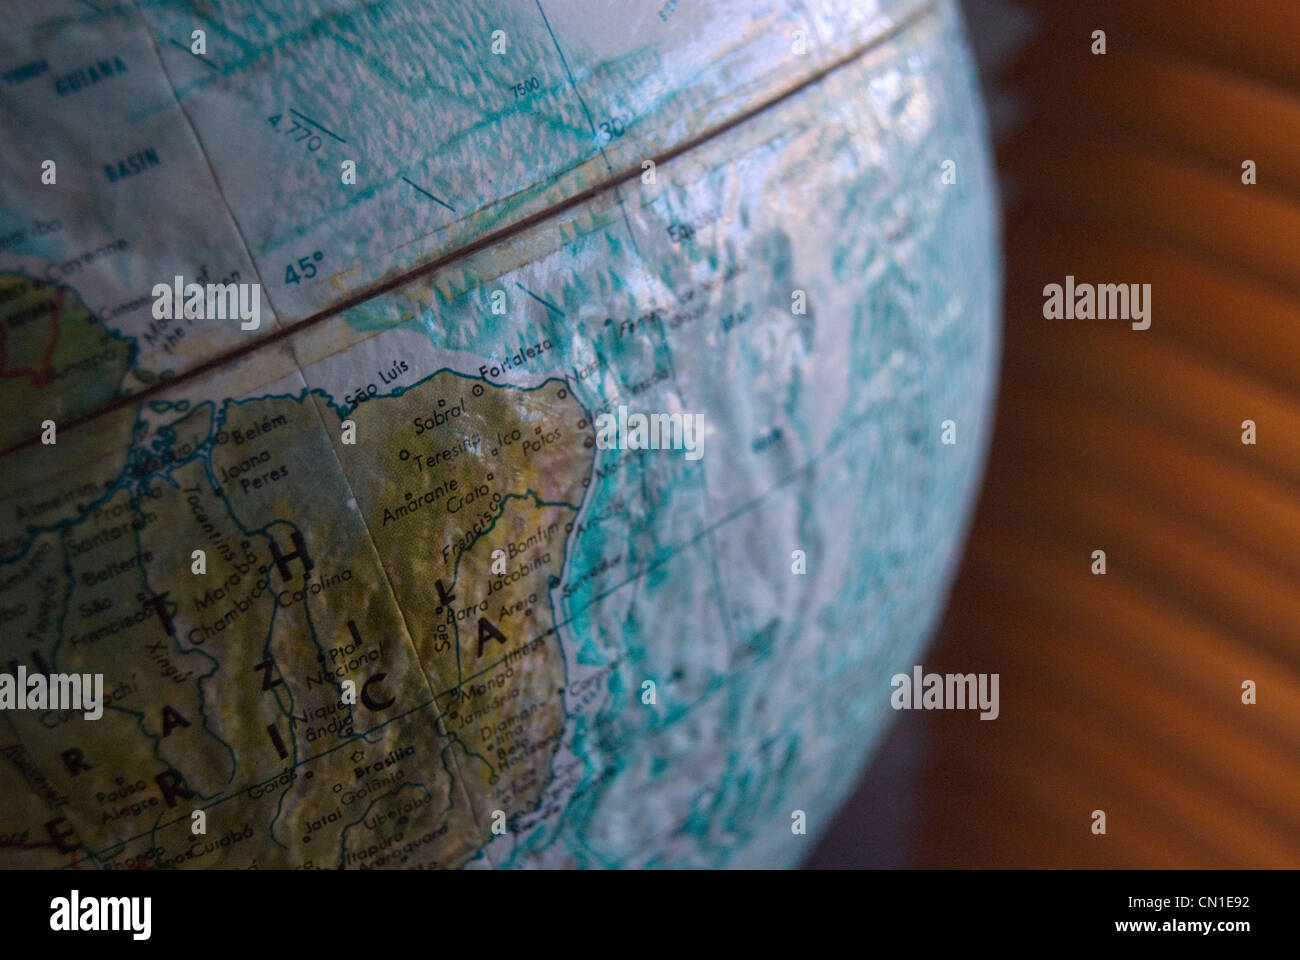 Globus, Nahaufnahme Stockbild